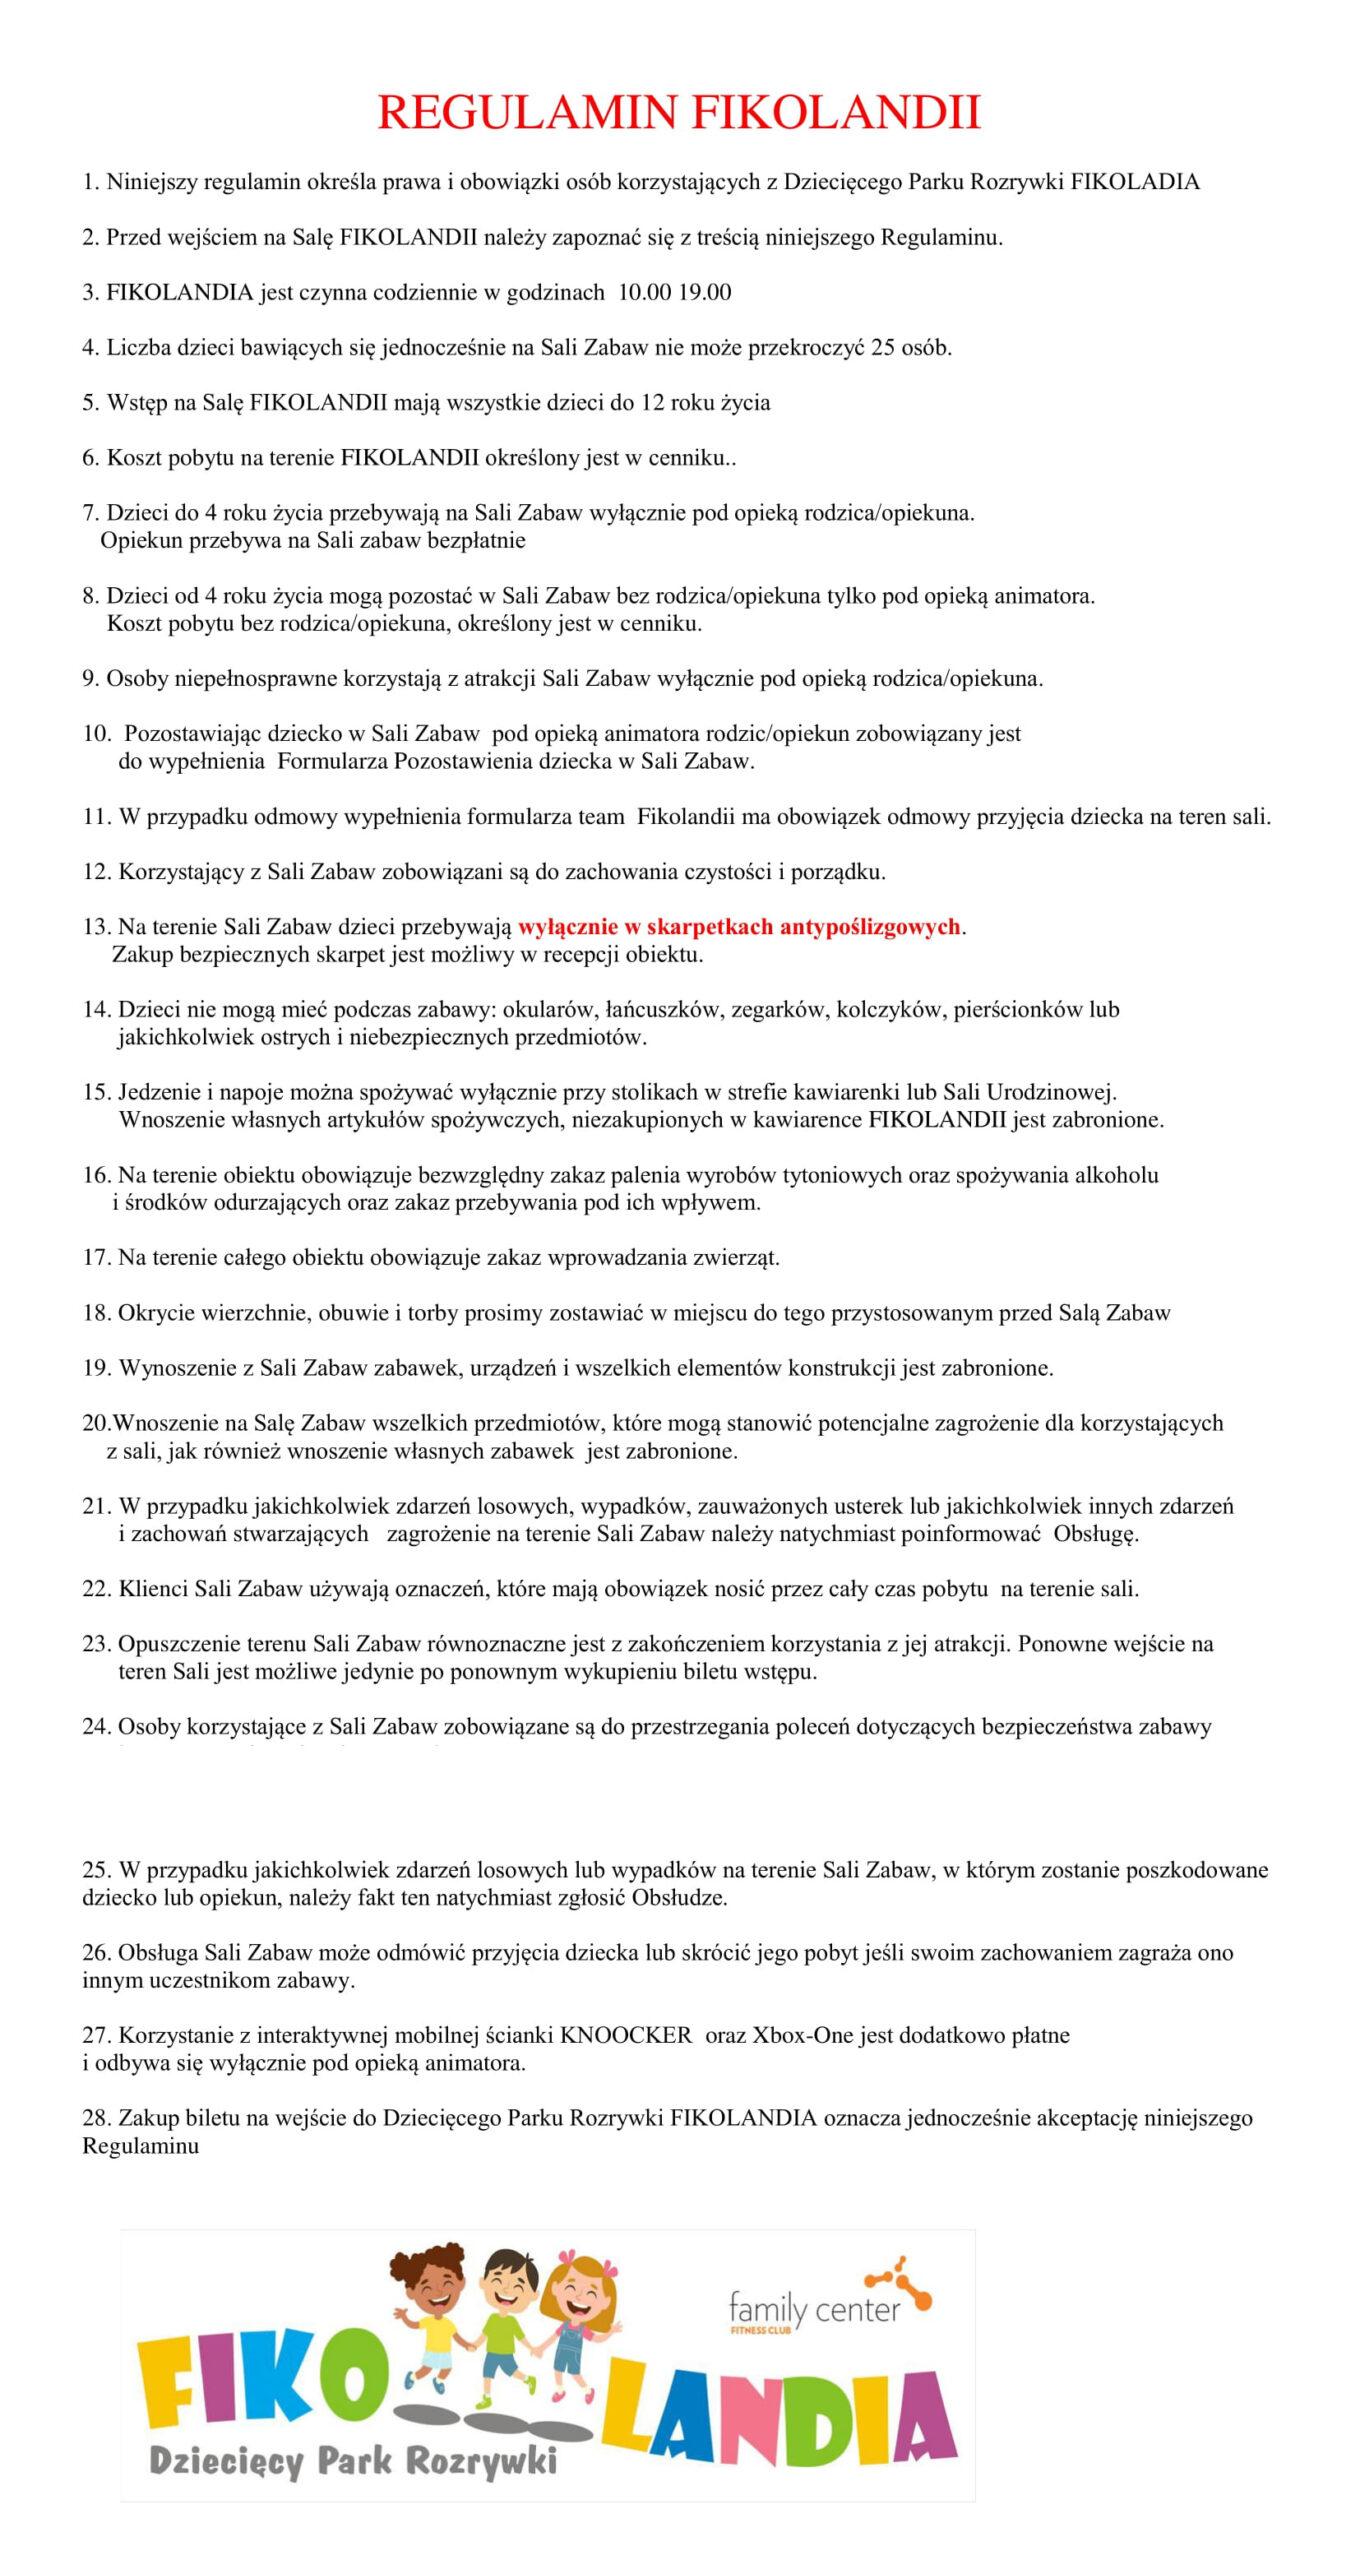 Regulamin Fikolandii nowy 17.09